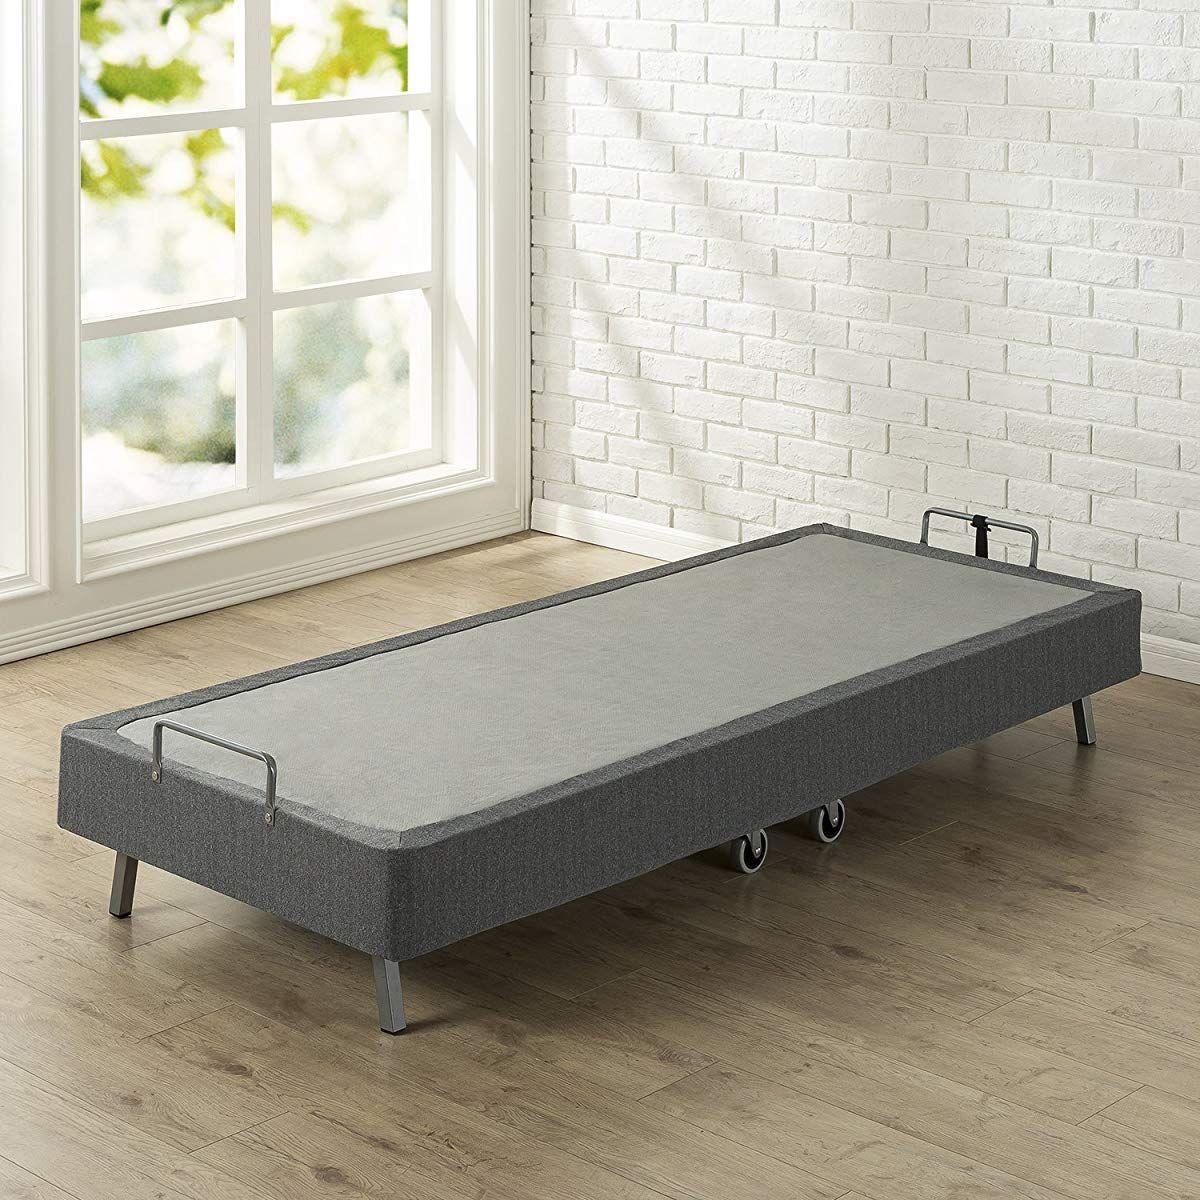 Zinus Memory Foam Resort Folding Guest Bed With Wheels Narrow